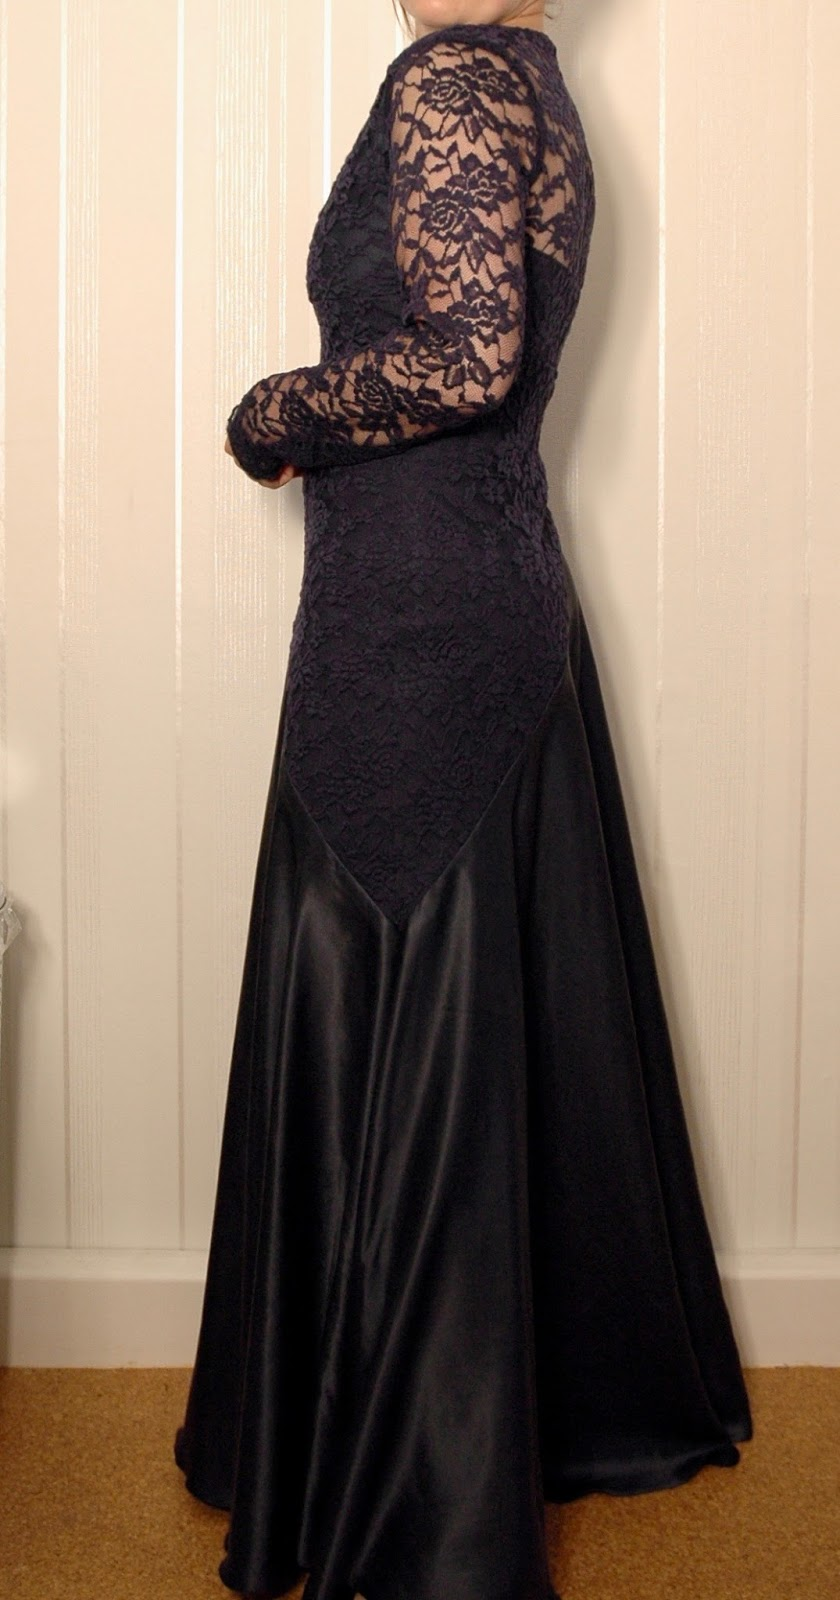 Kleid zu kurz gekurzt